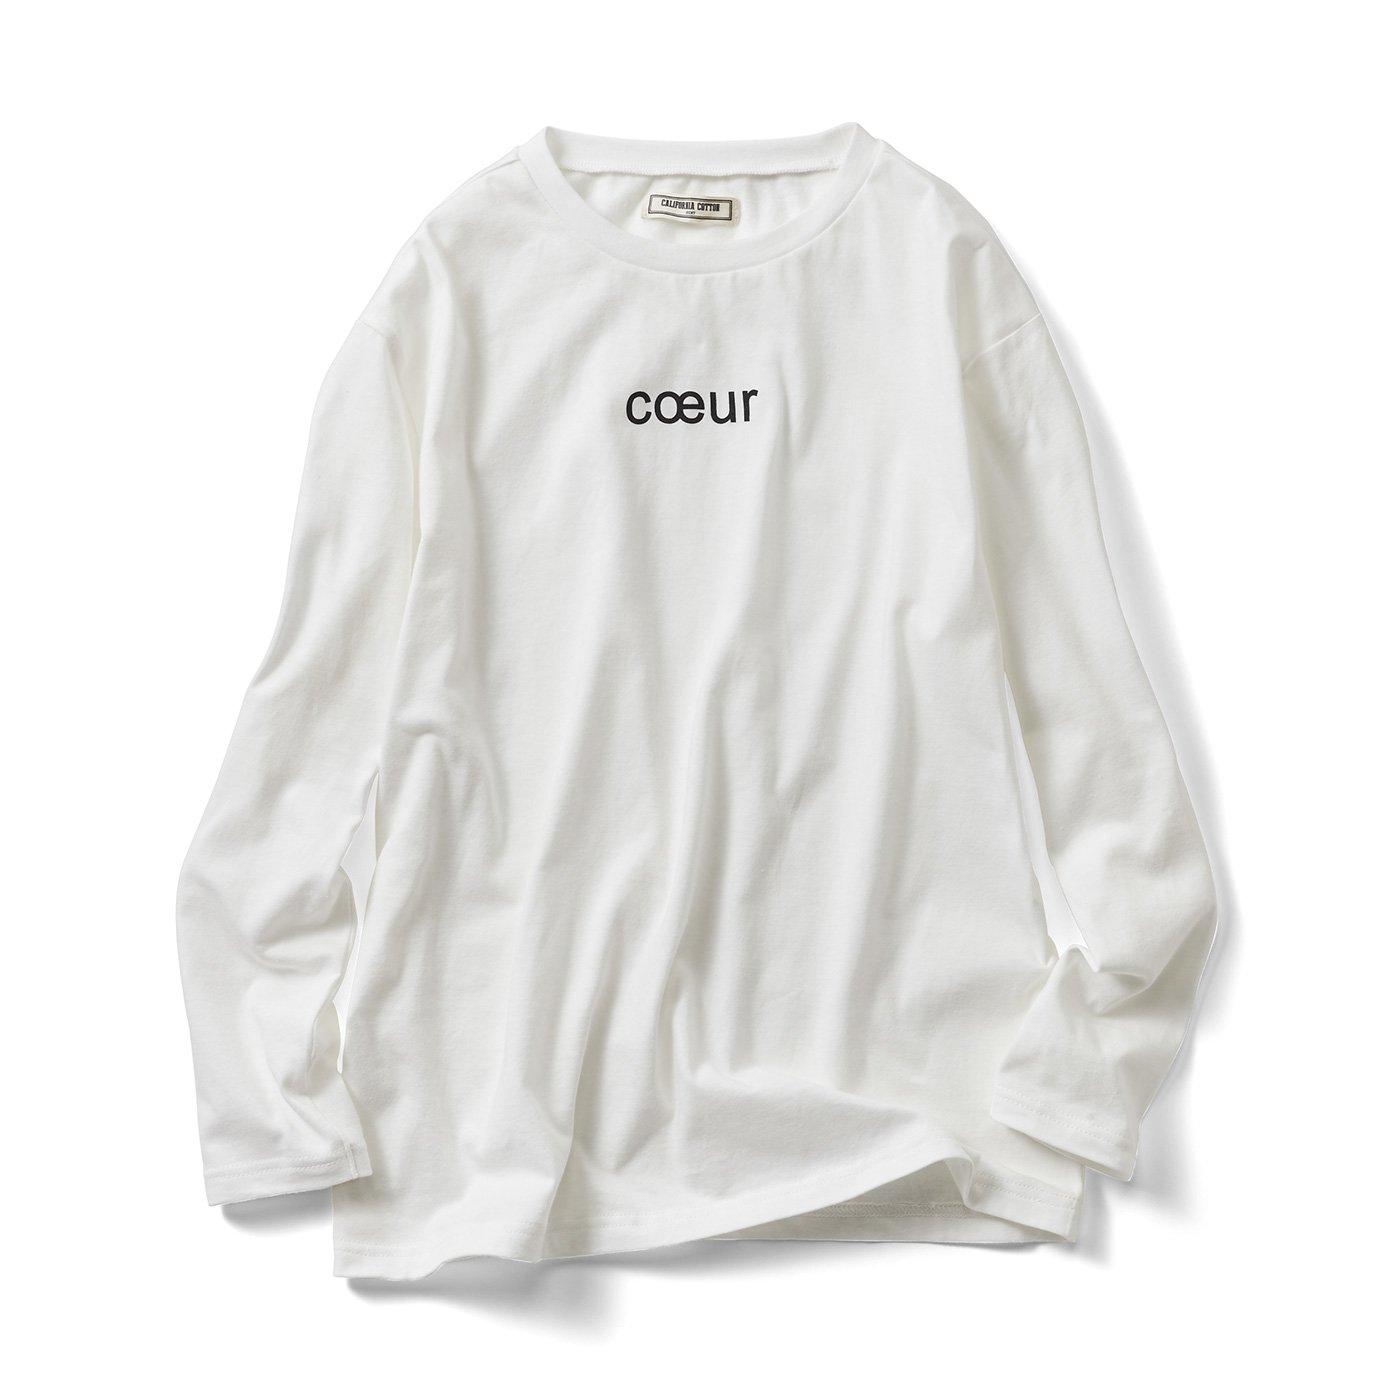 IEDIT[イディット] カリフォルニアコットンの大人ロゴTシャツの会